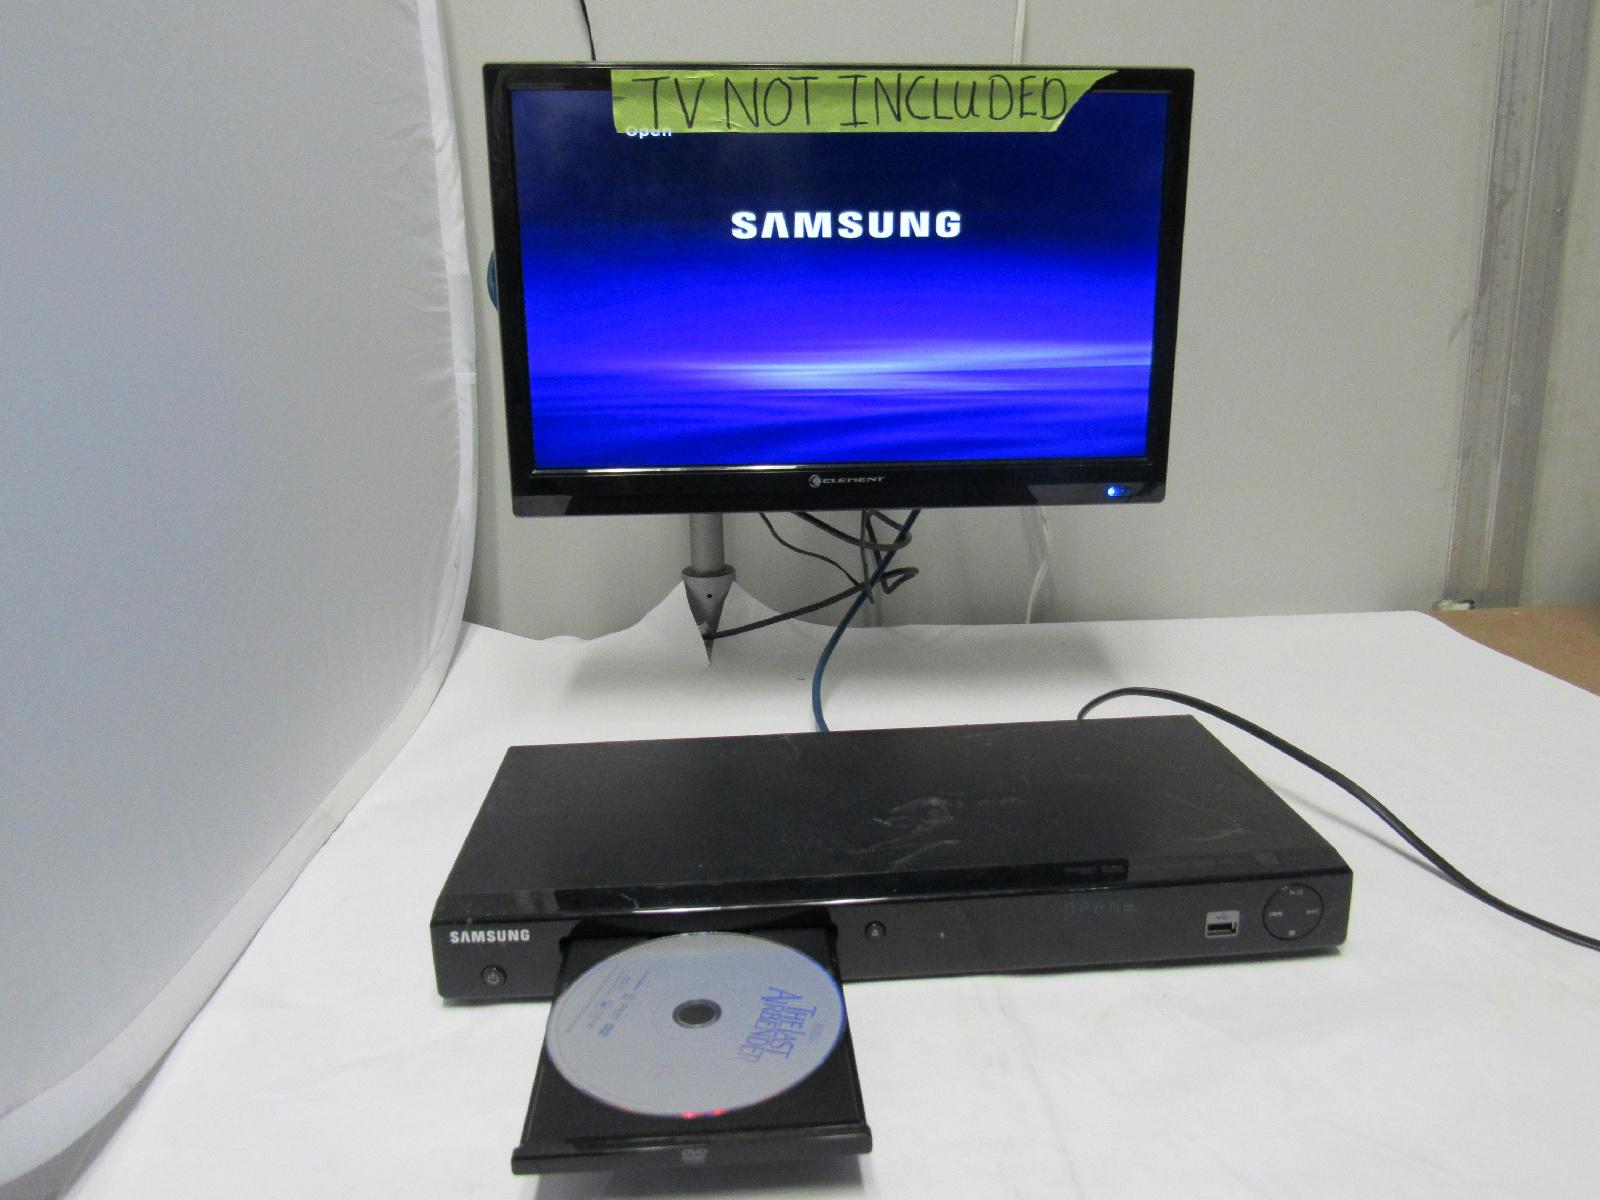 samsung dvd 1080p9 dvd player hdmi receiver. Black Bedroom Furniture Sets. Home Design Ideas